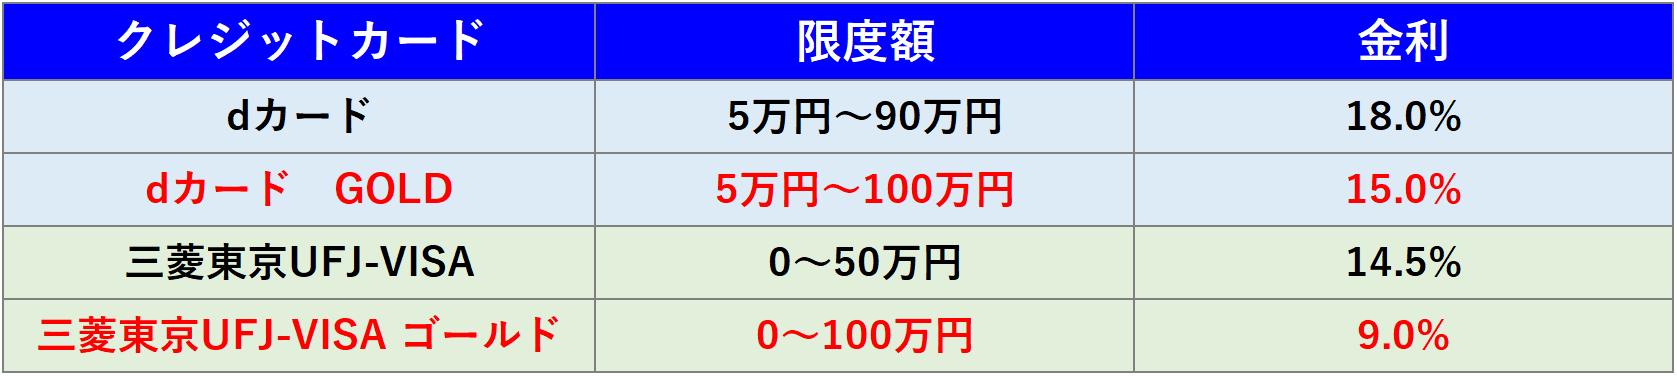 dカード GOLD・三菱東京UFJ-VISA ゴールド 限度額・金利